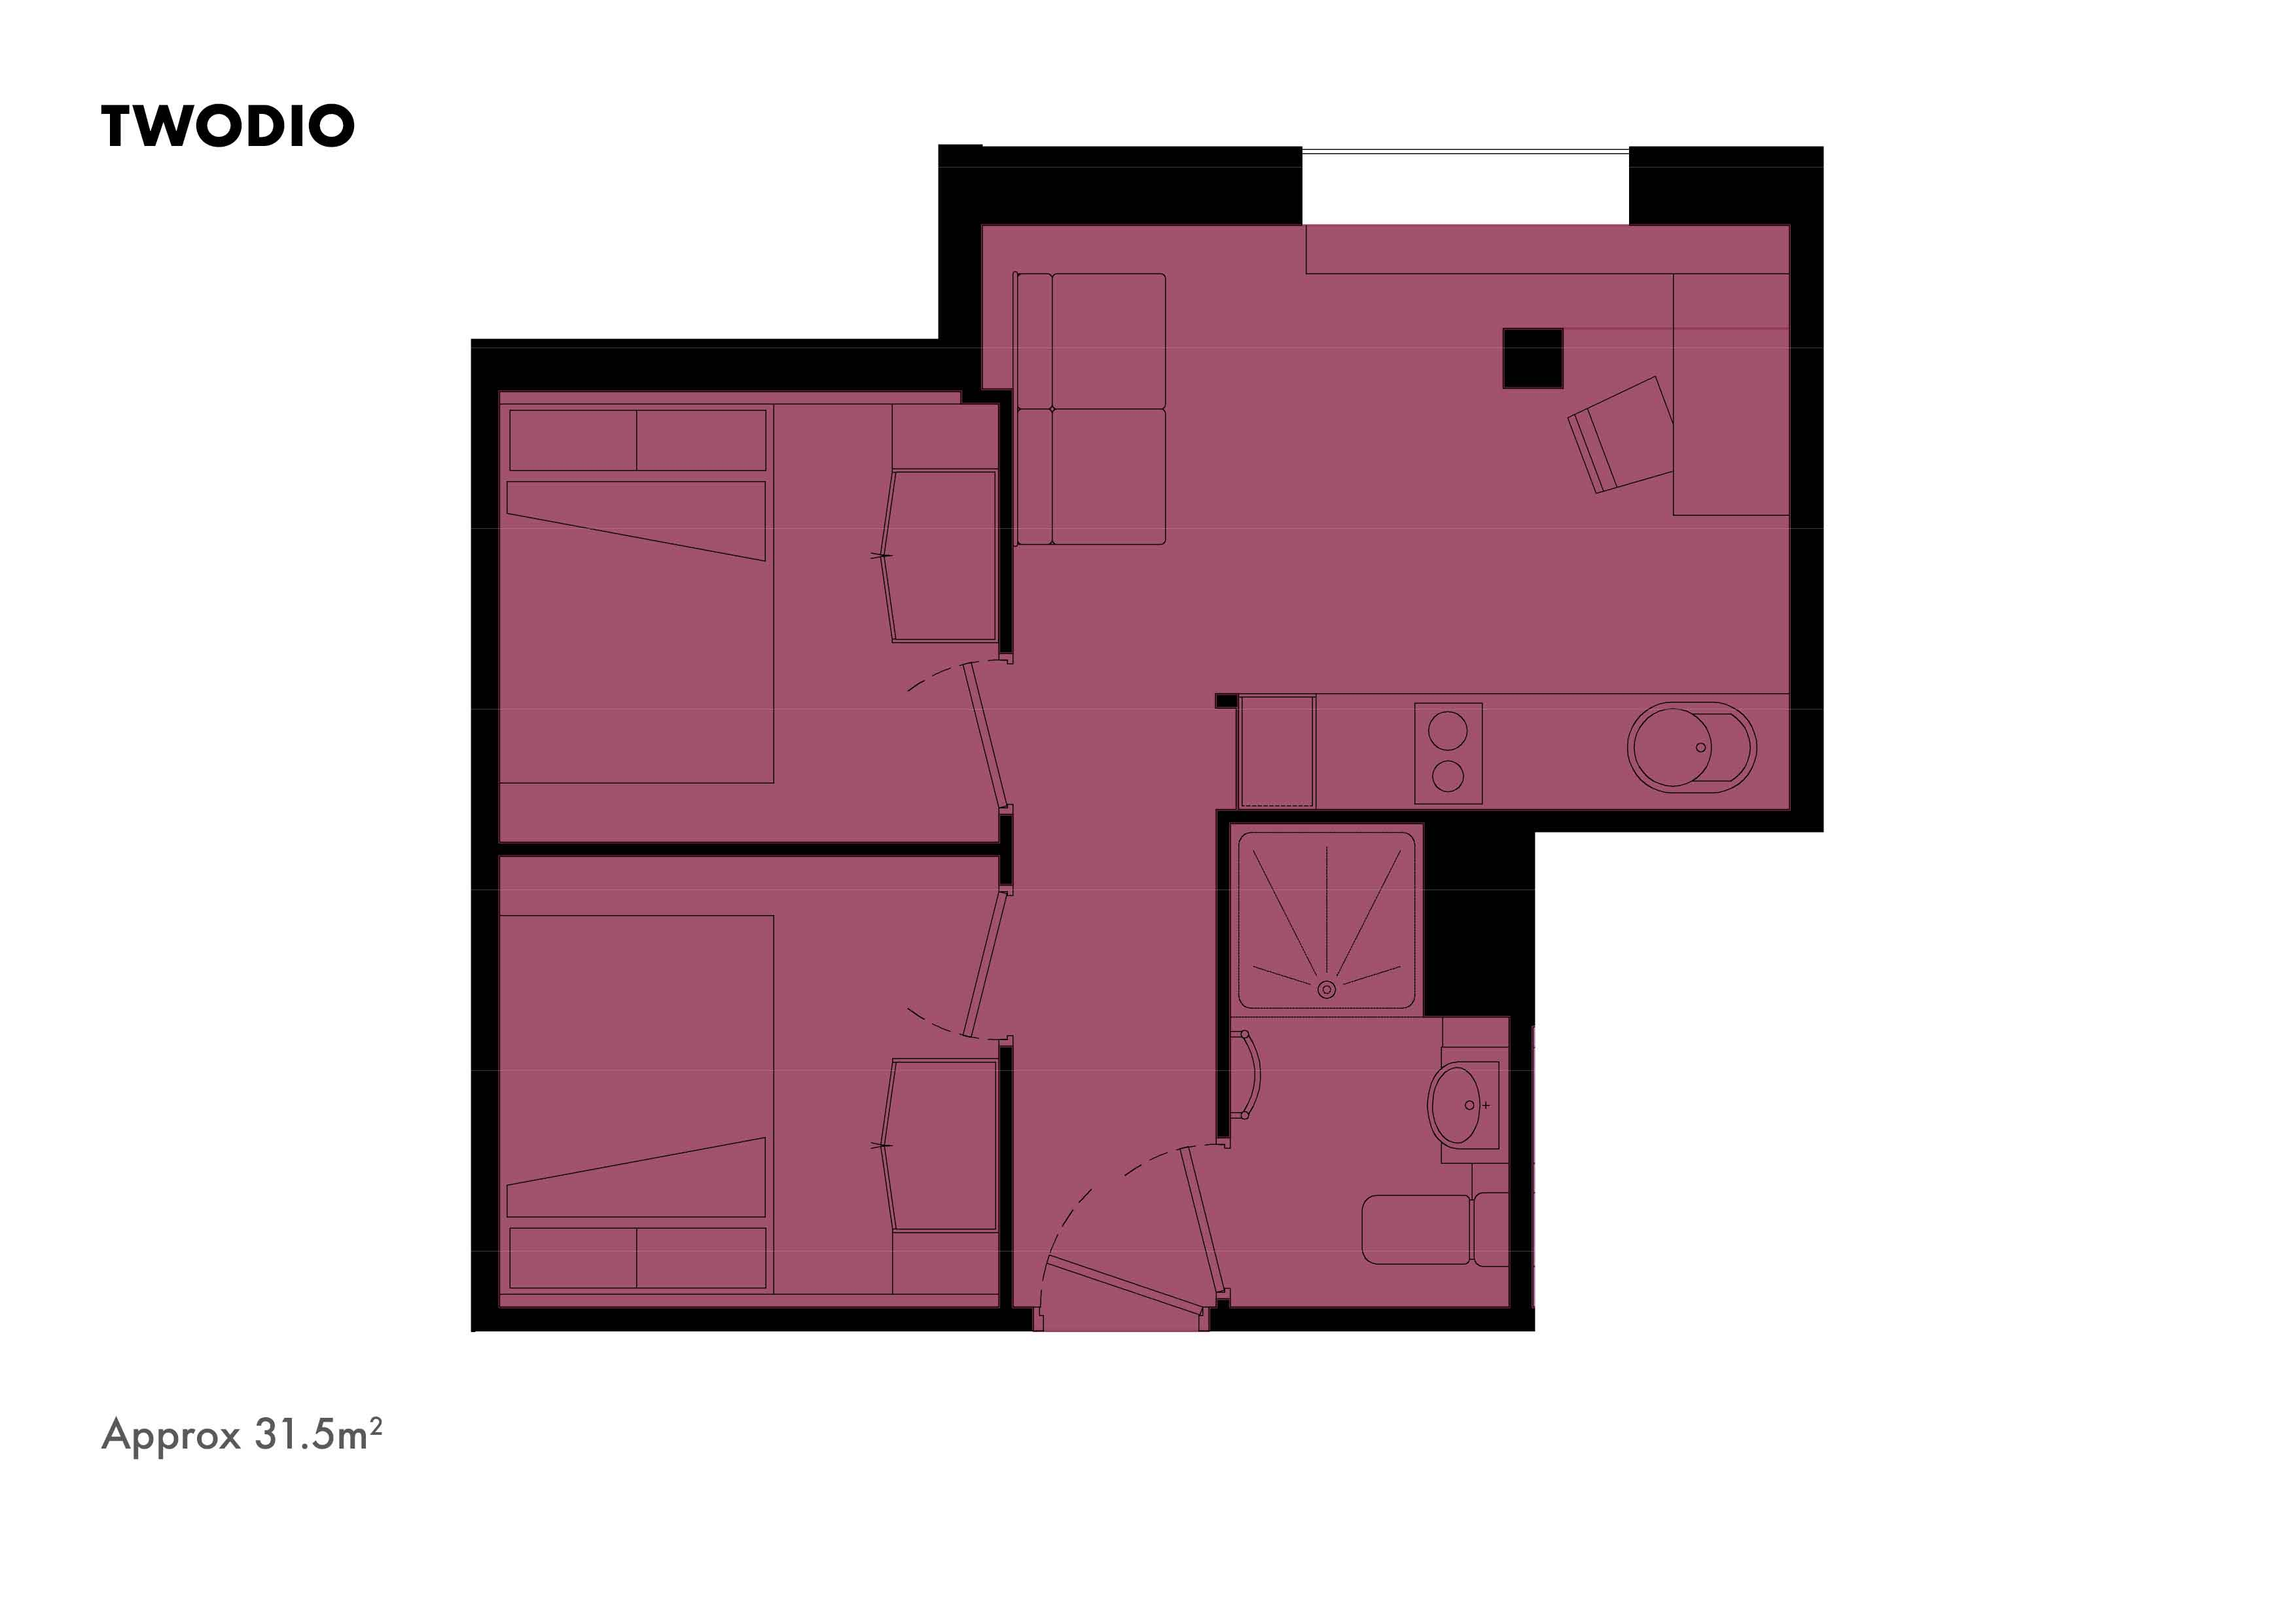 Twodio floorplans